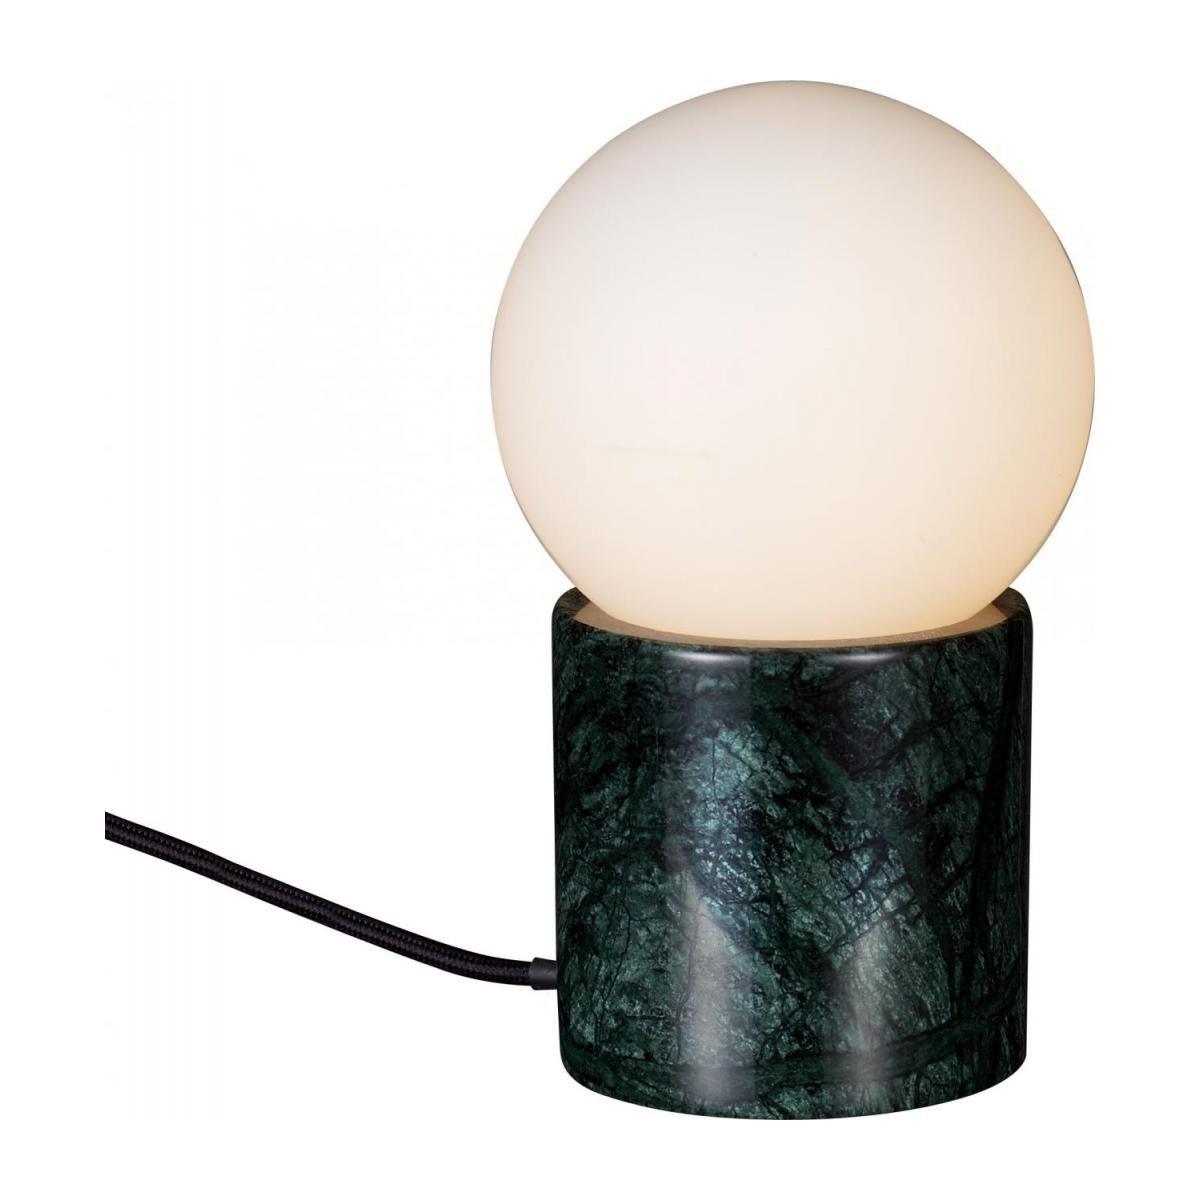 Marball Lampe De Table En Marbre Verre Marble Table Lamp Green